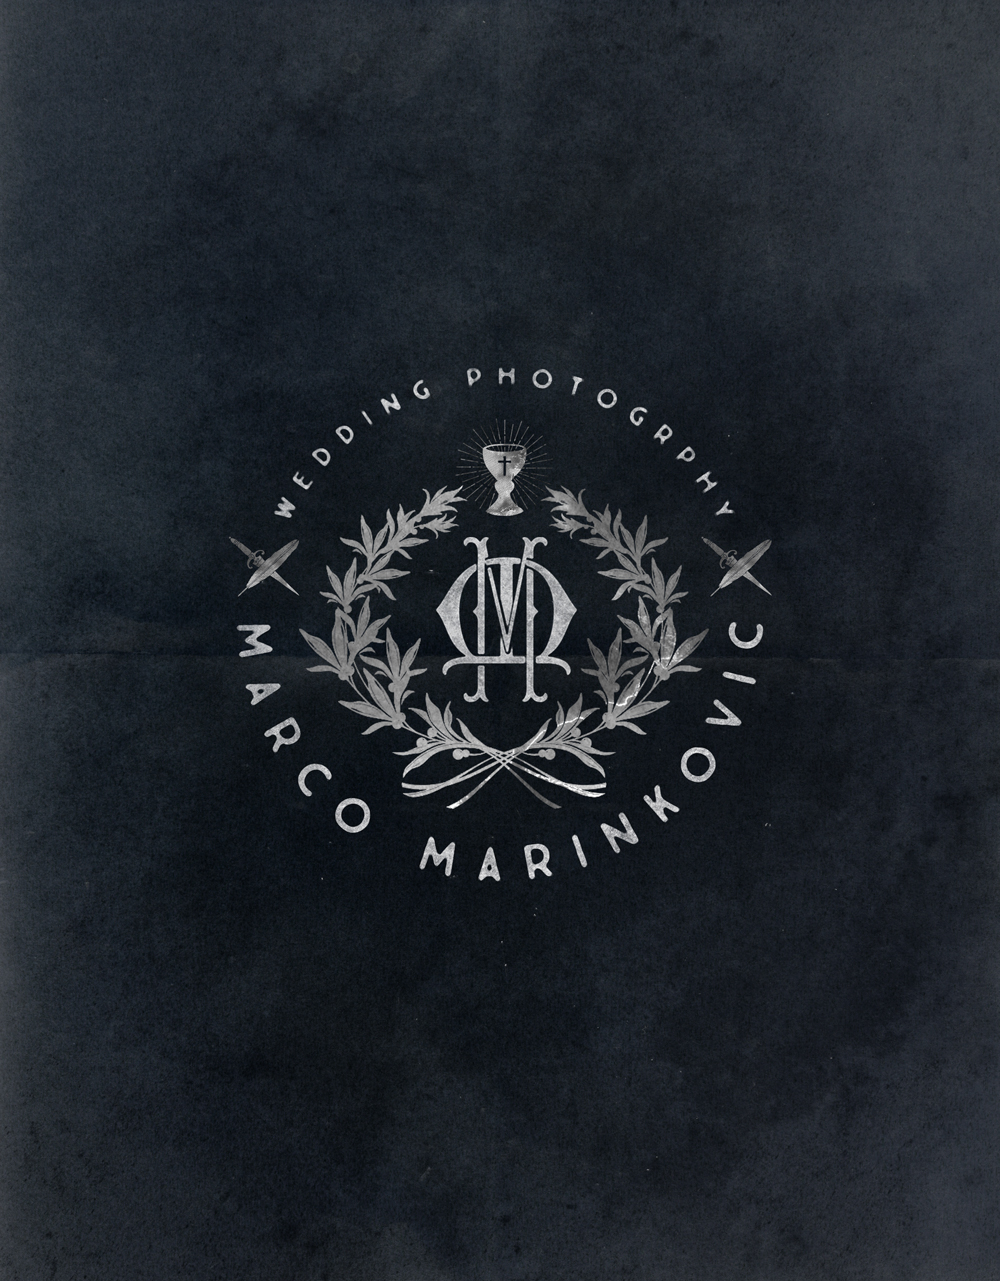 marco_marinkovic_logos04_neg.jpg